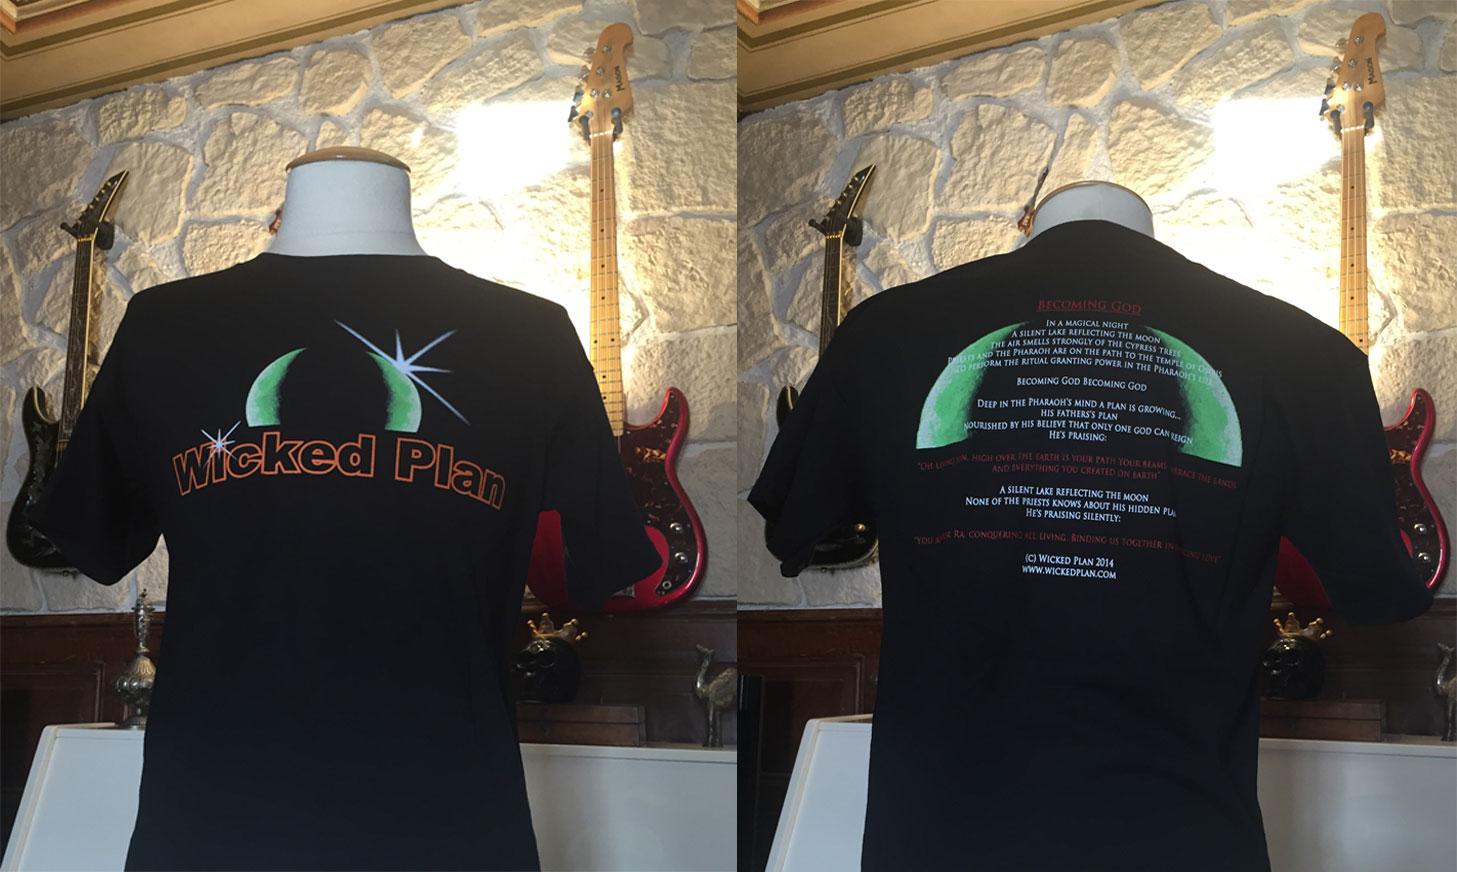 Becoming God T-Shirt